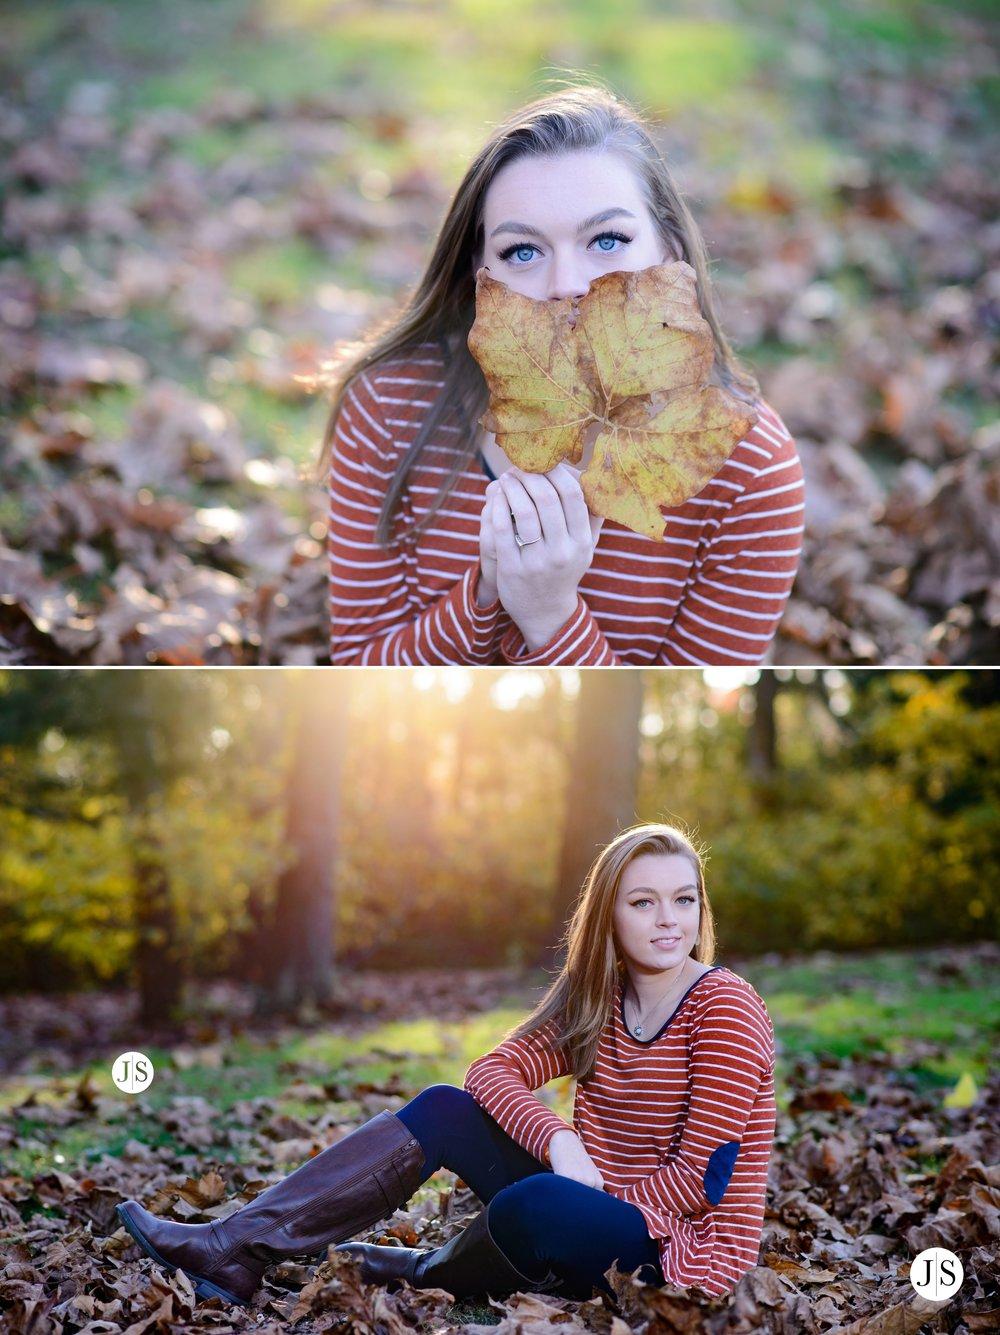 senior-portrait-polevault-pemberton-park-maryland-portraits-photo 12.jpg